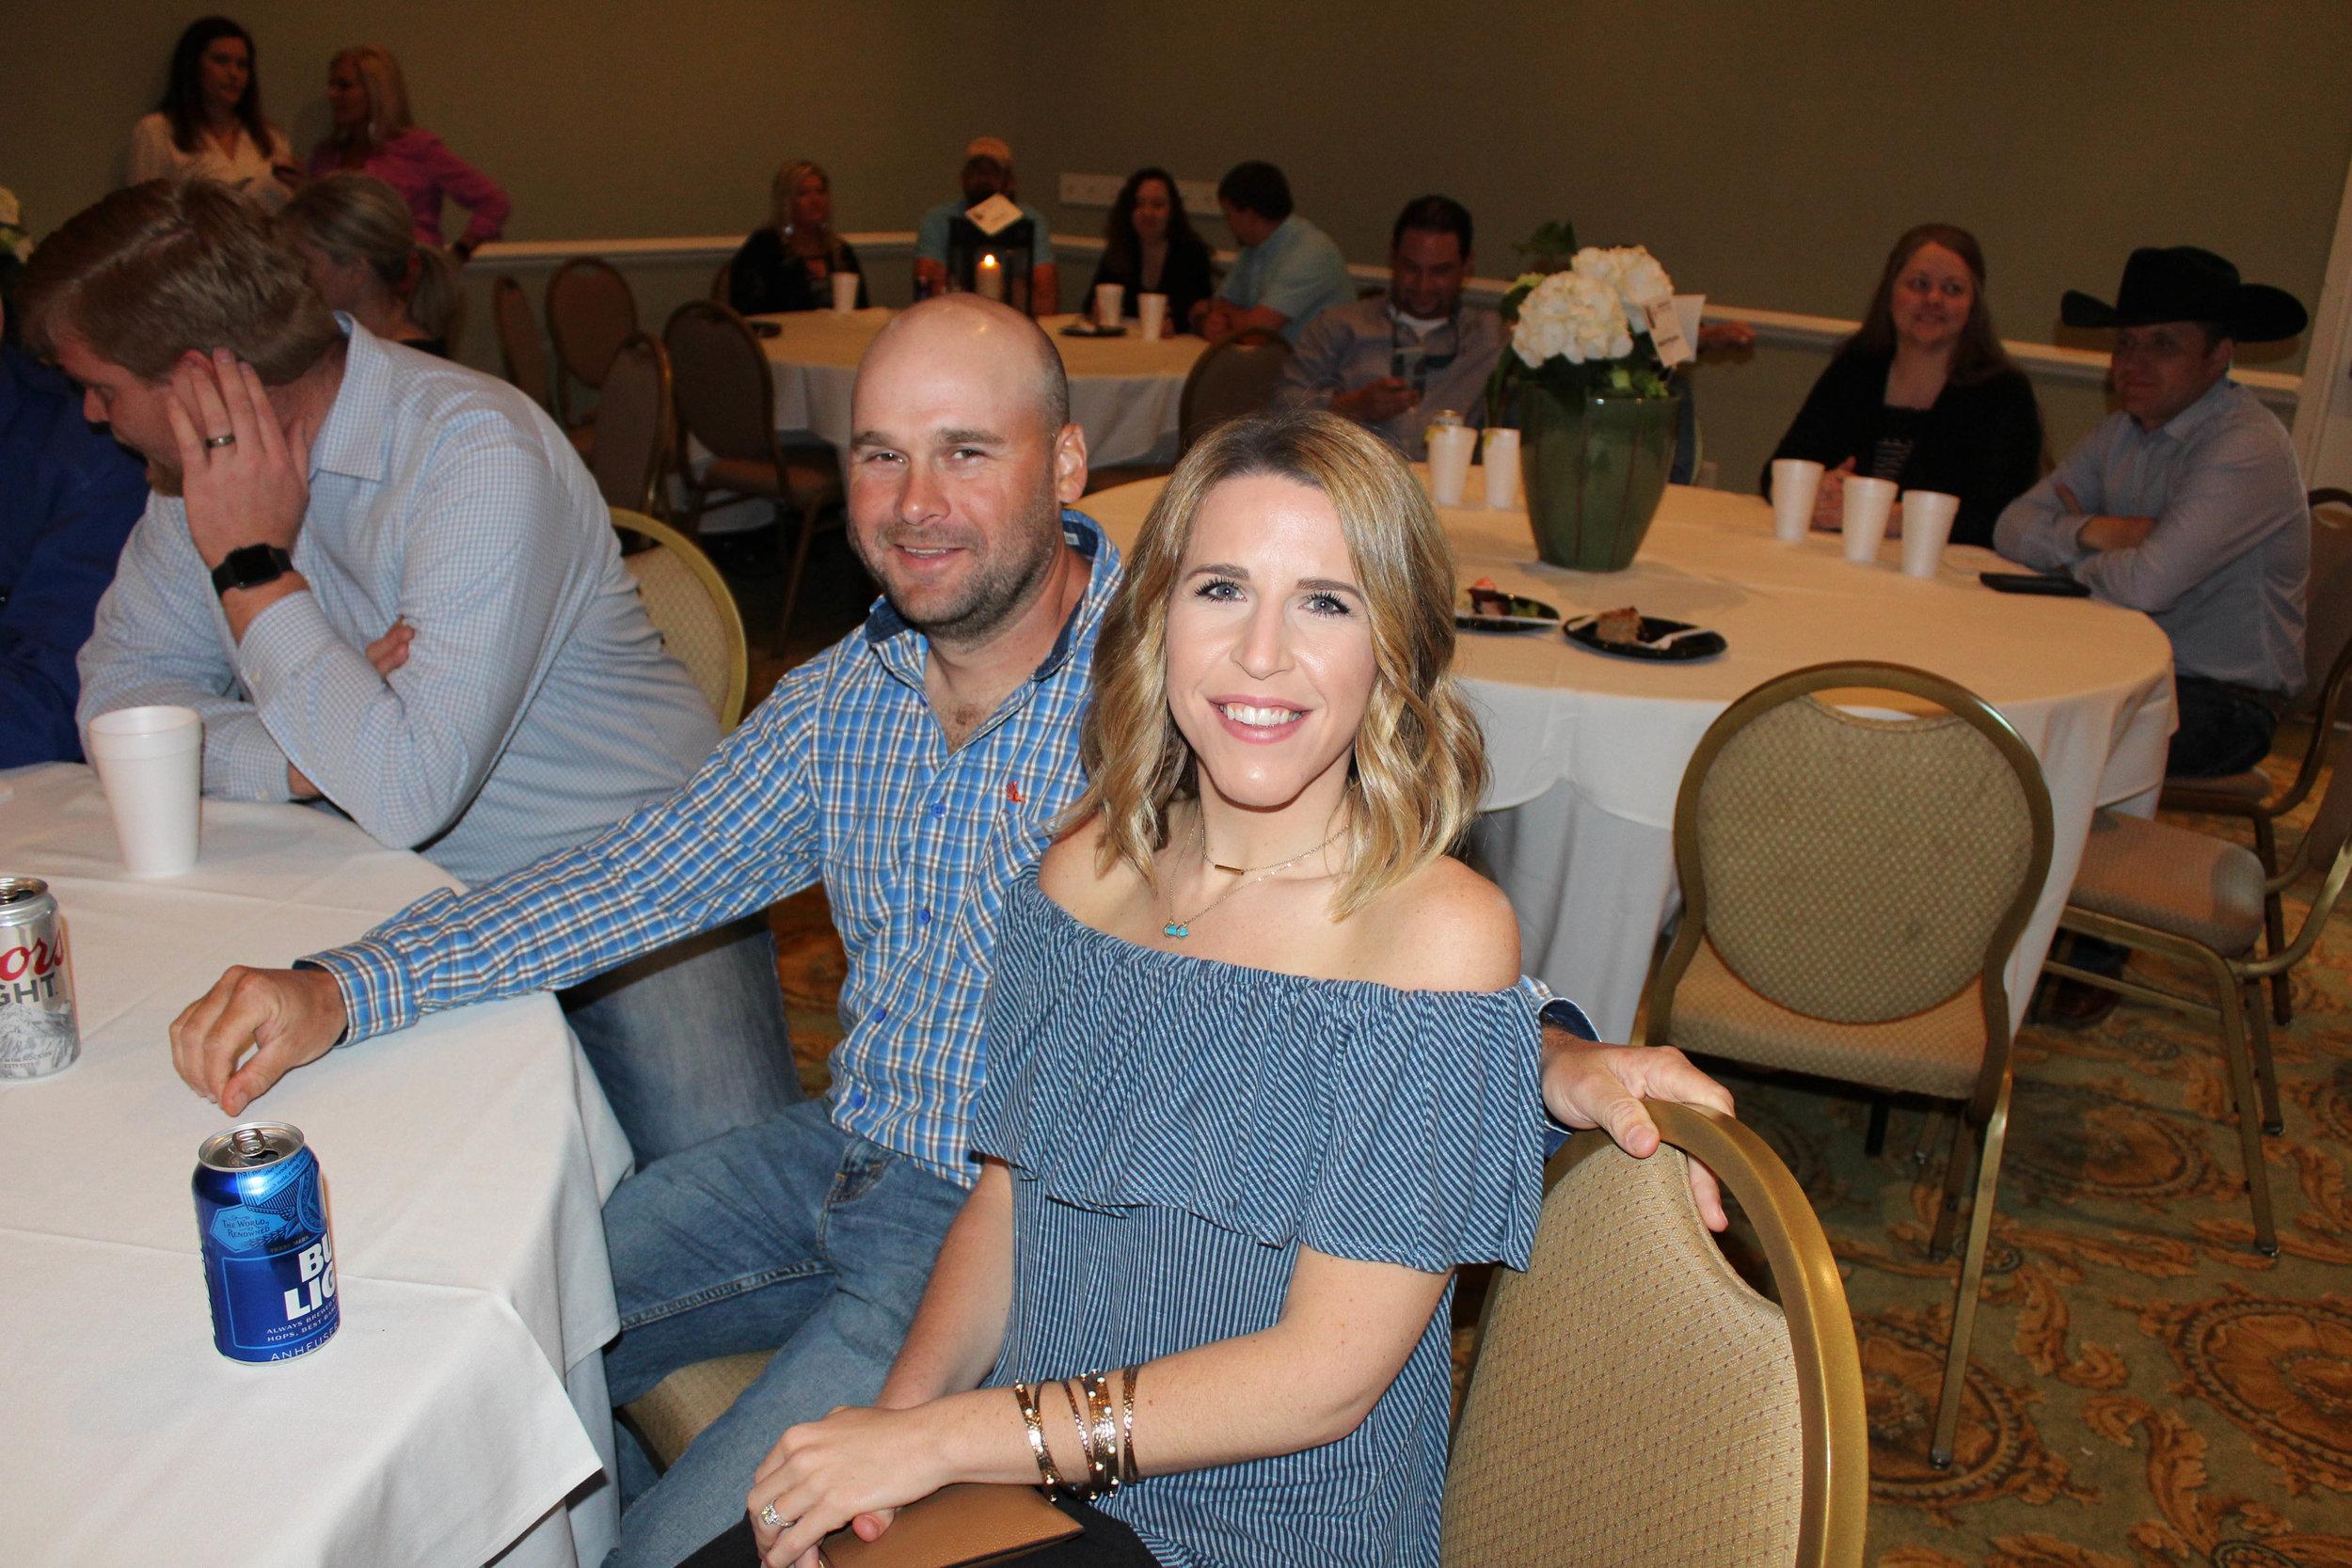 Josh and Kathryn Kurtz